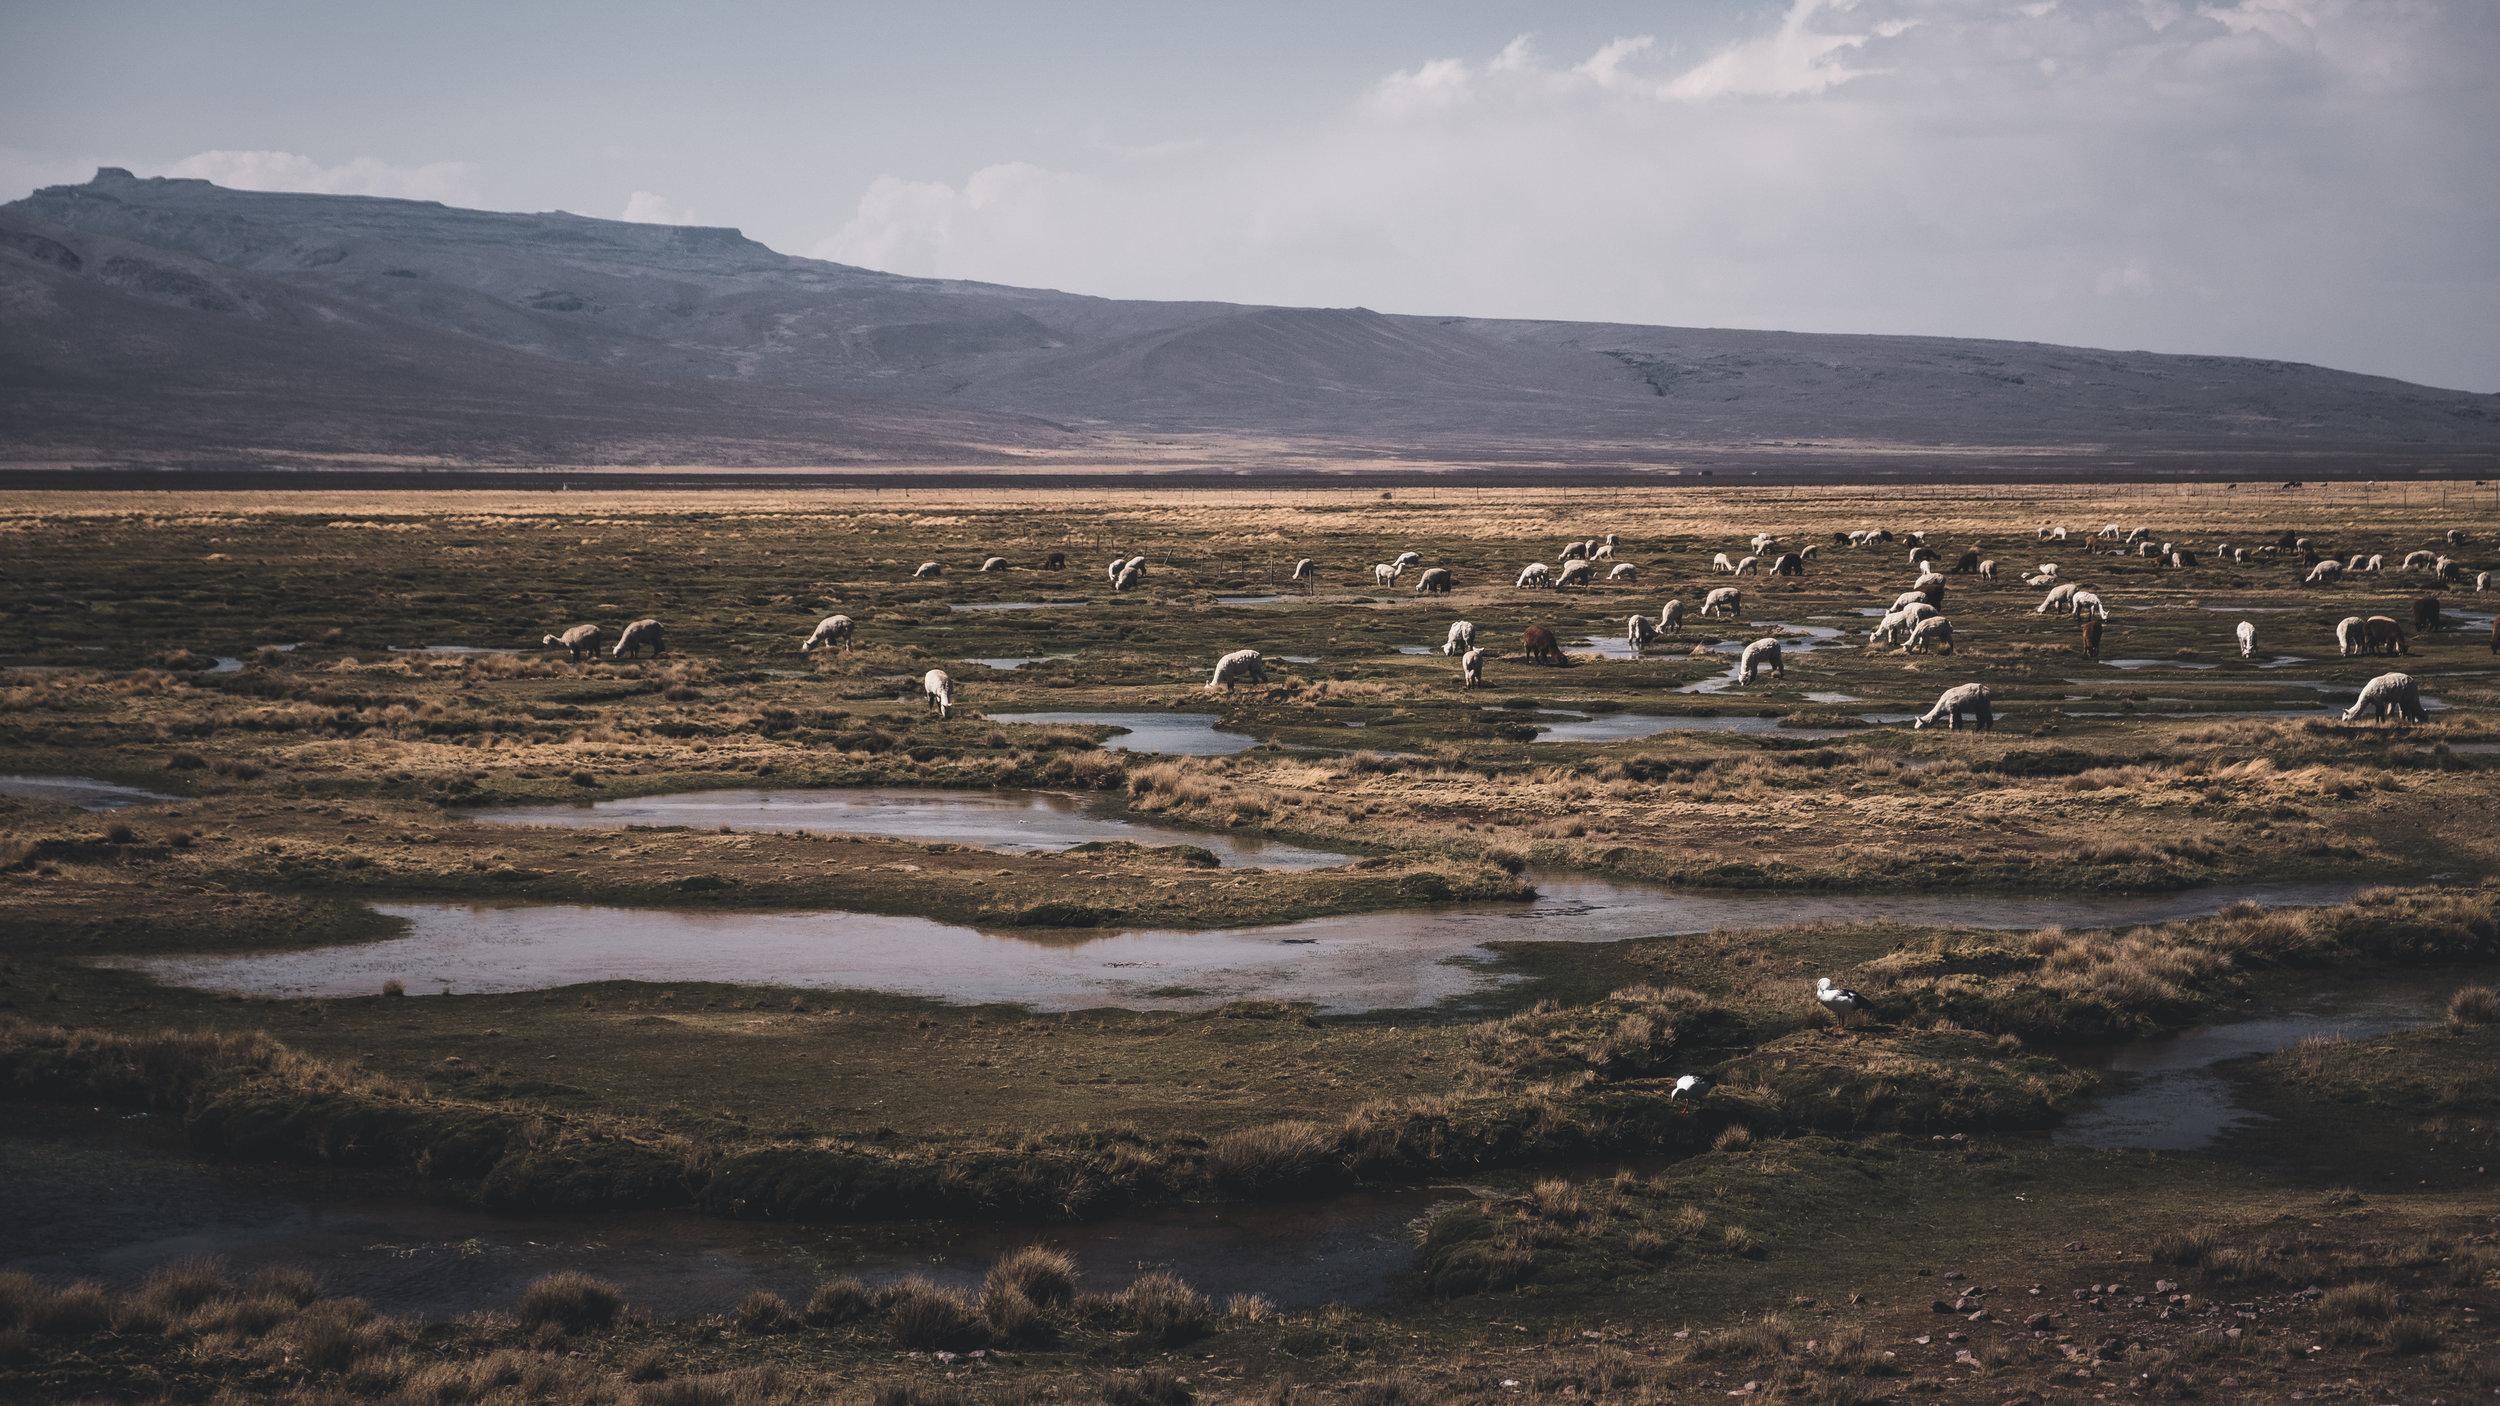 Alpacas in the peruvian highlands | Arequipa